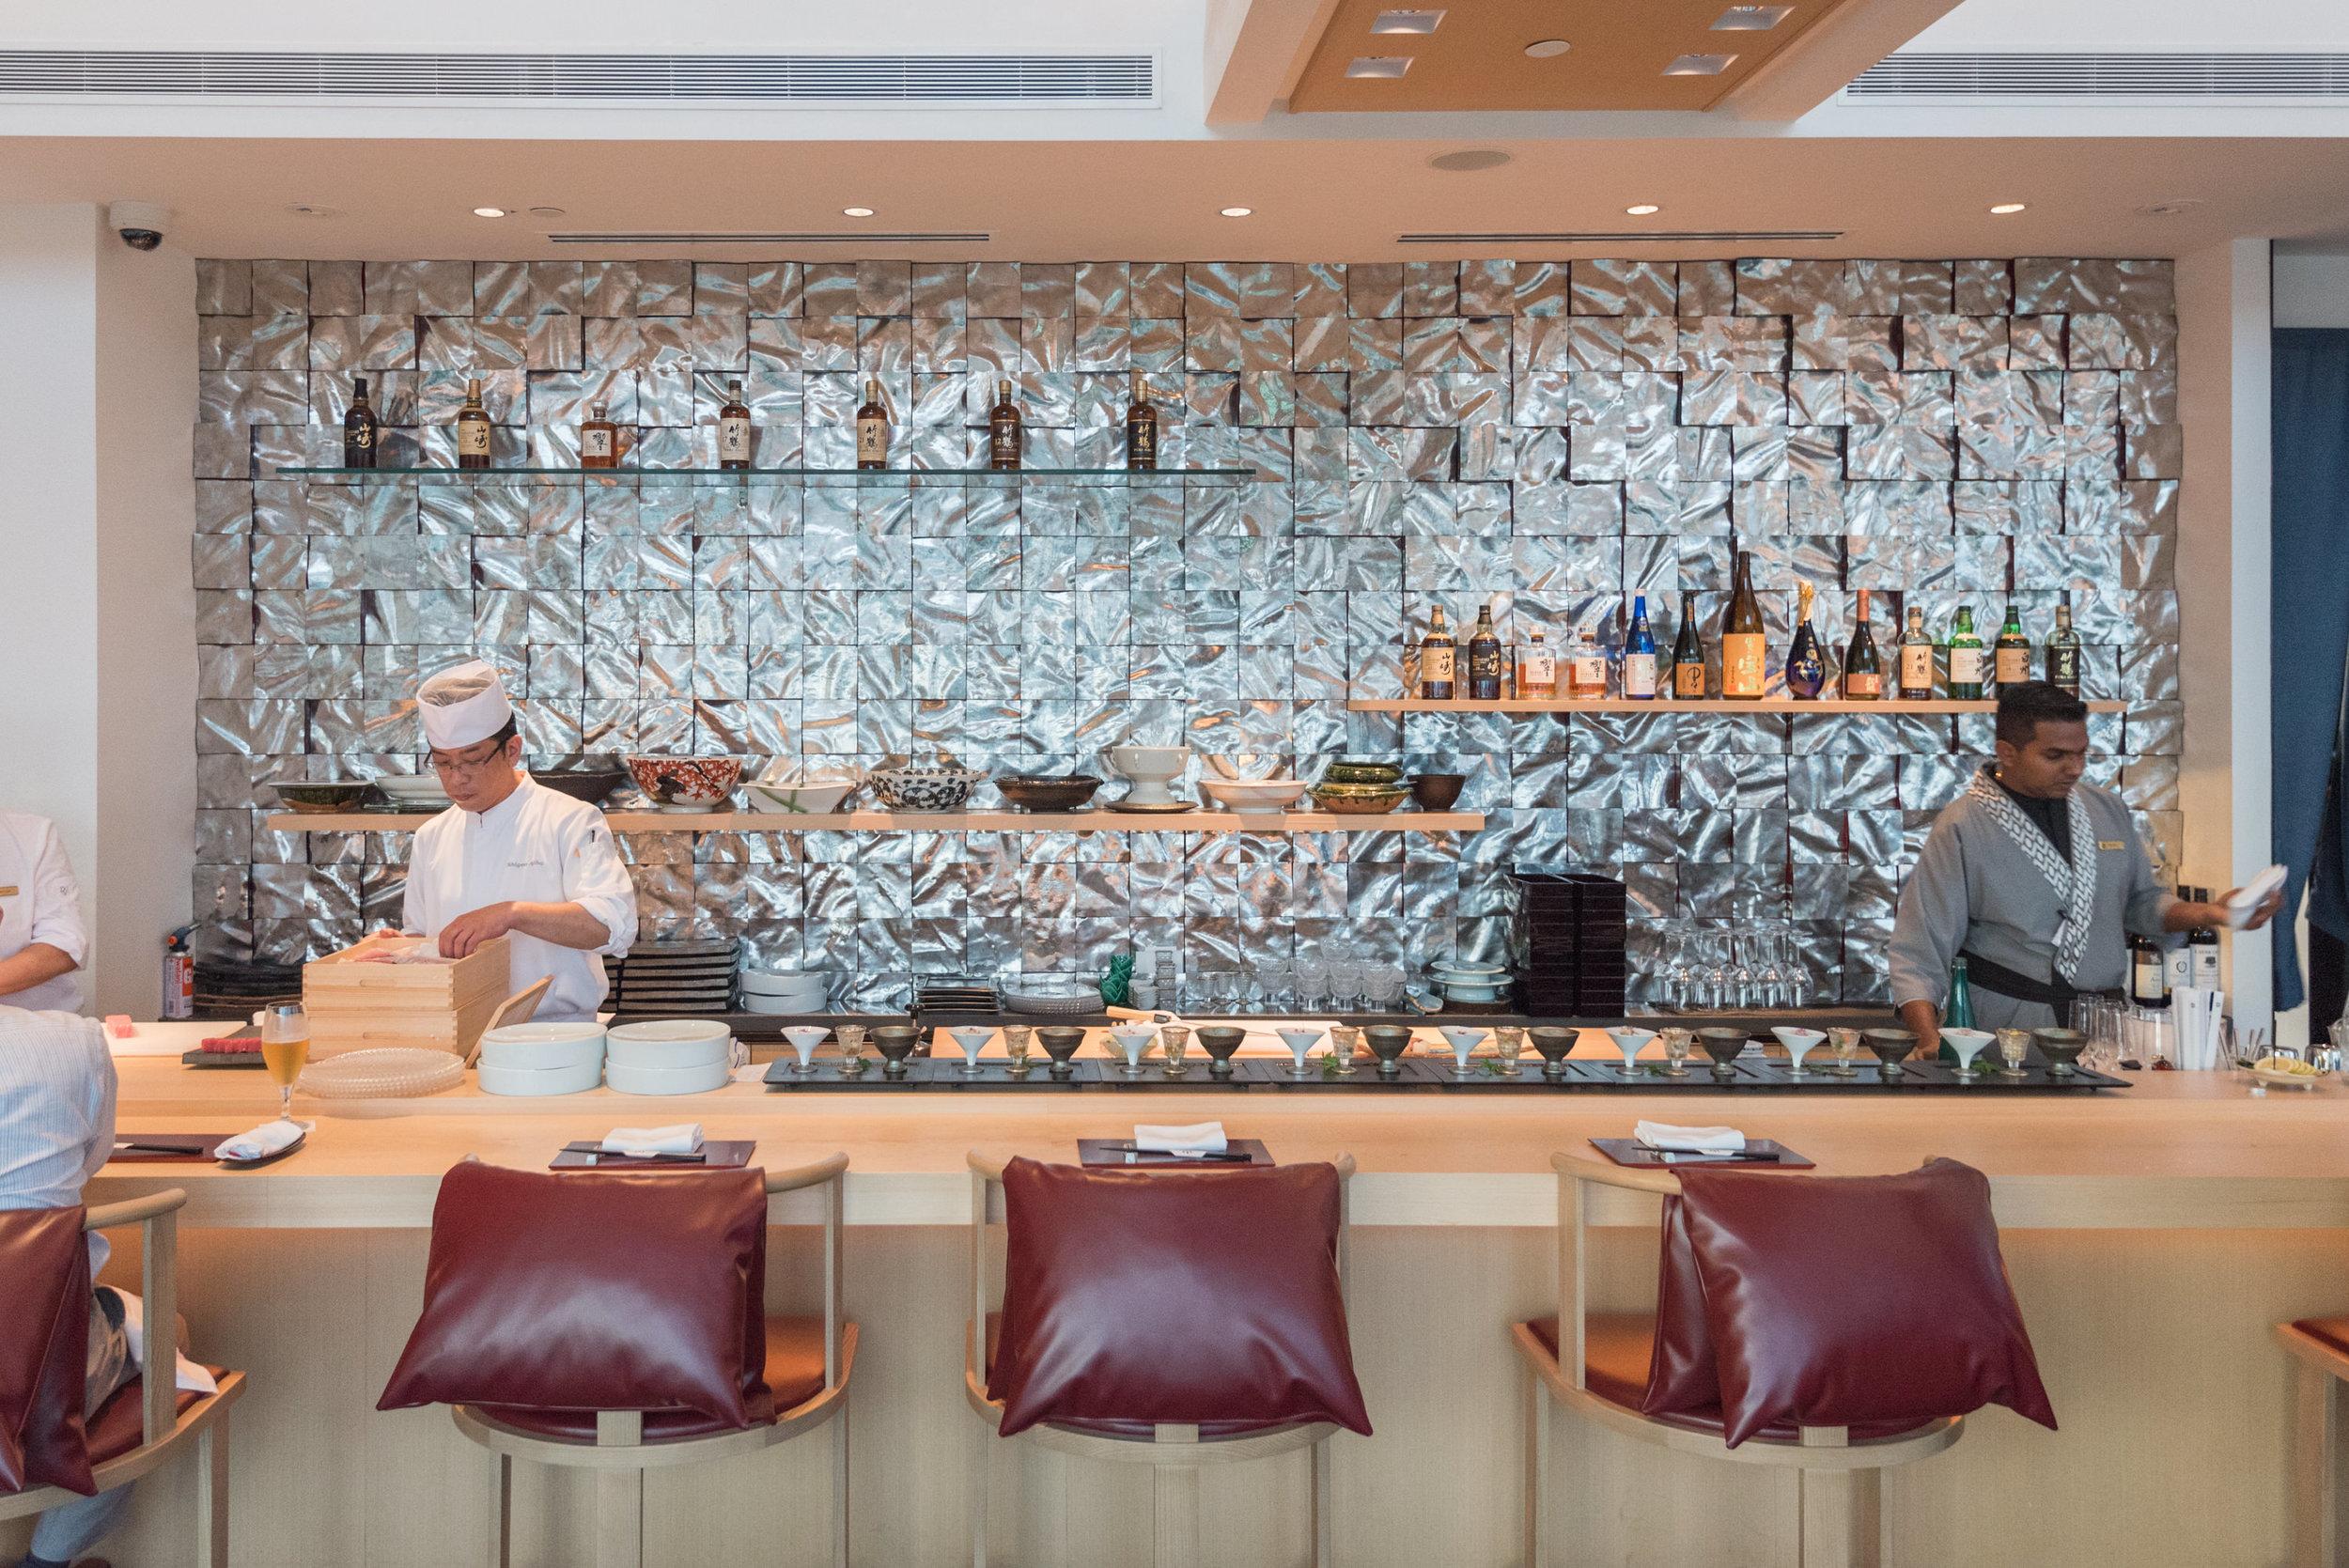 Chef Akiba at the Sushi Counter  NAMI - Shangri-La Hotel, Singapore